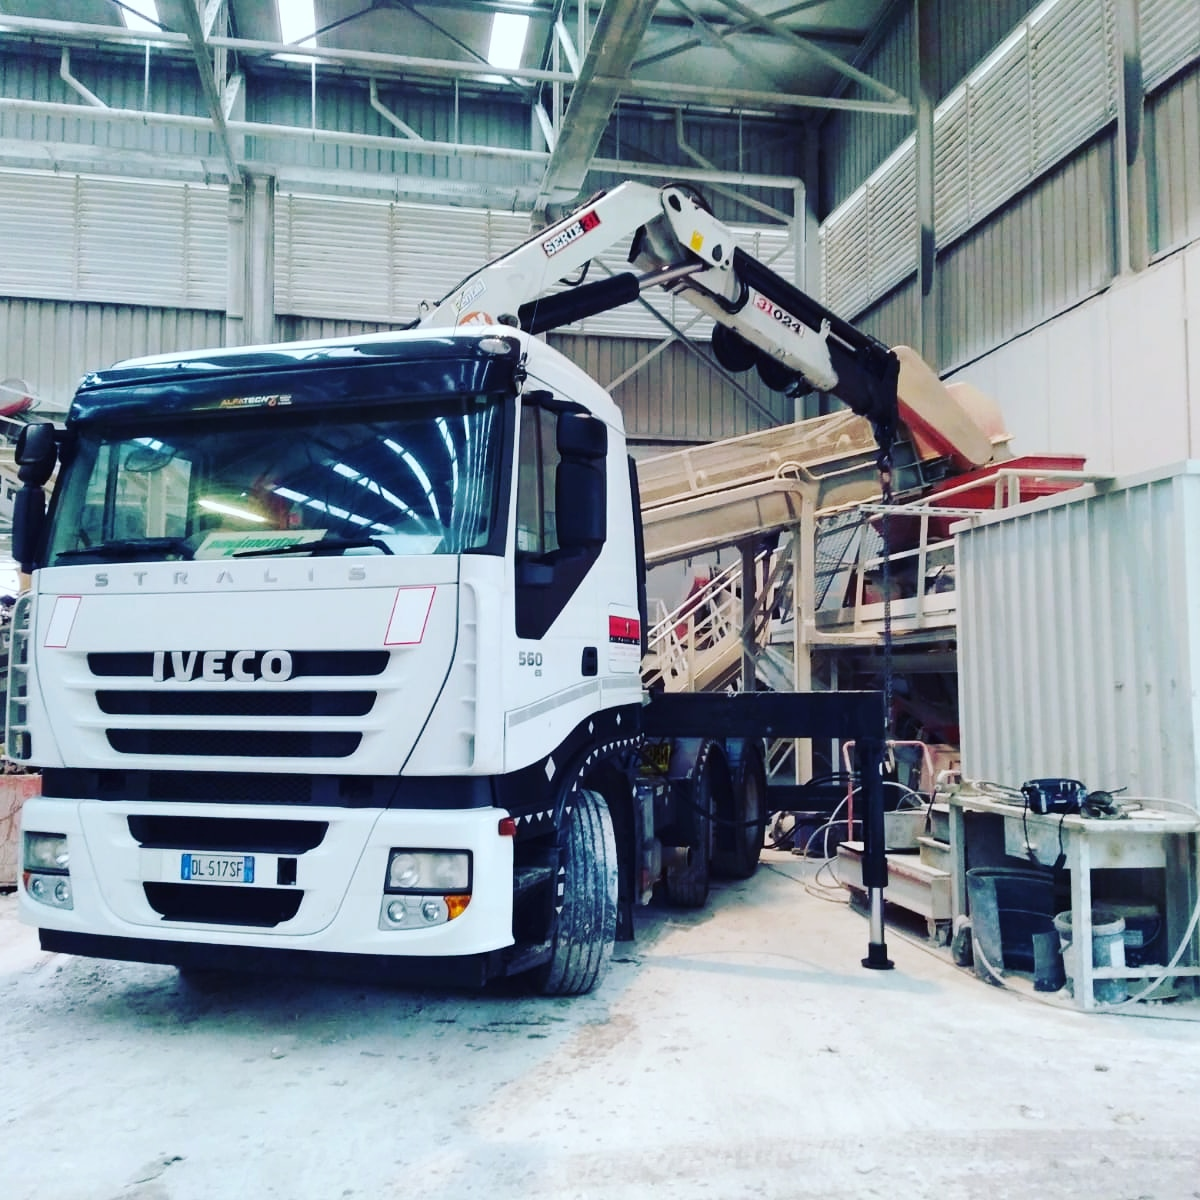 Rimini gru noleggio camion gru per sollevamento materiale edile a Rimini